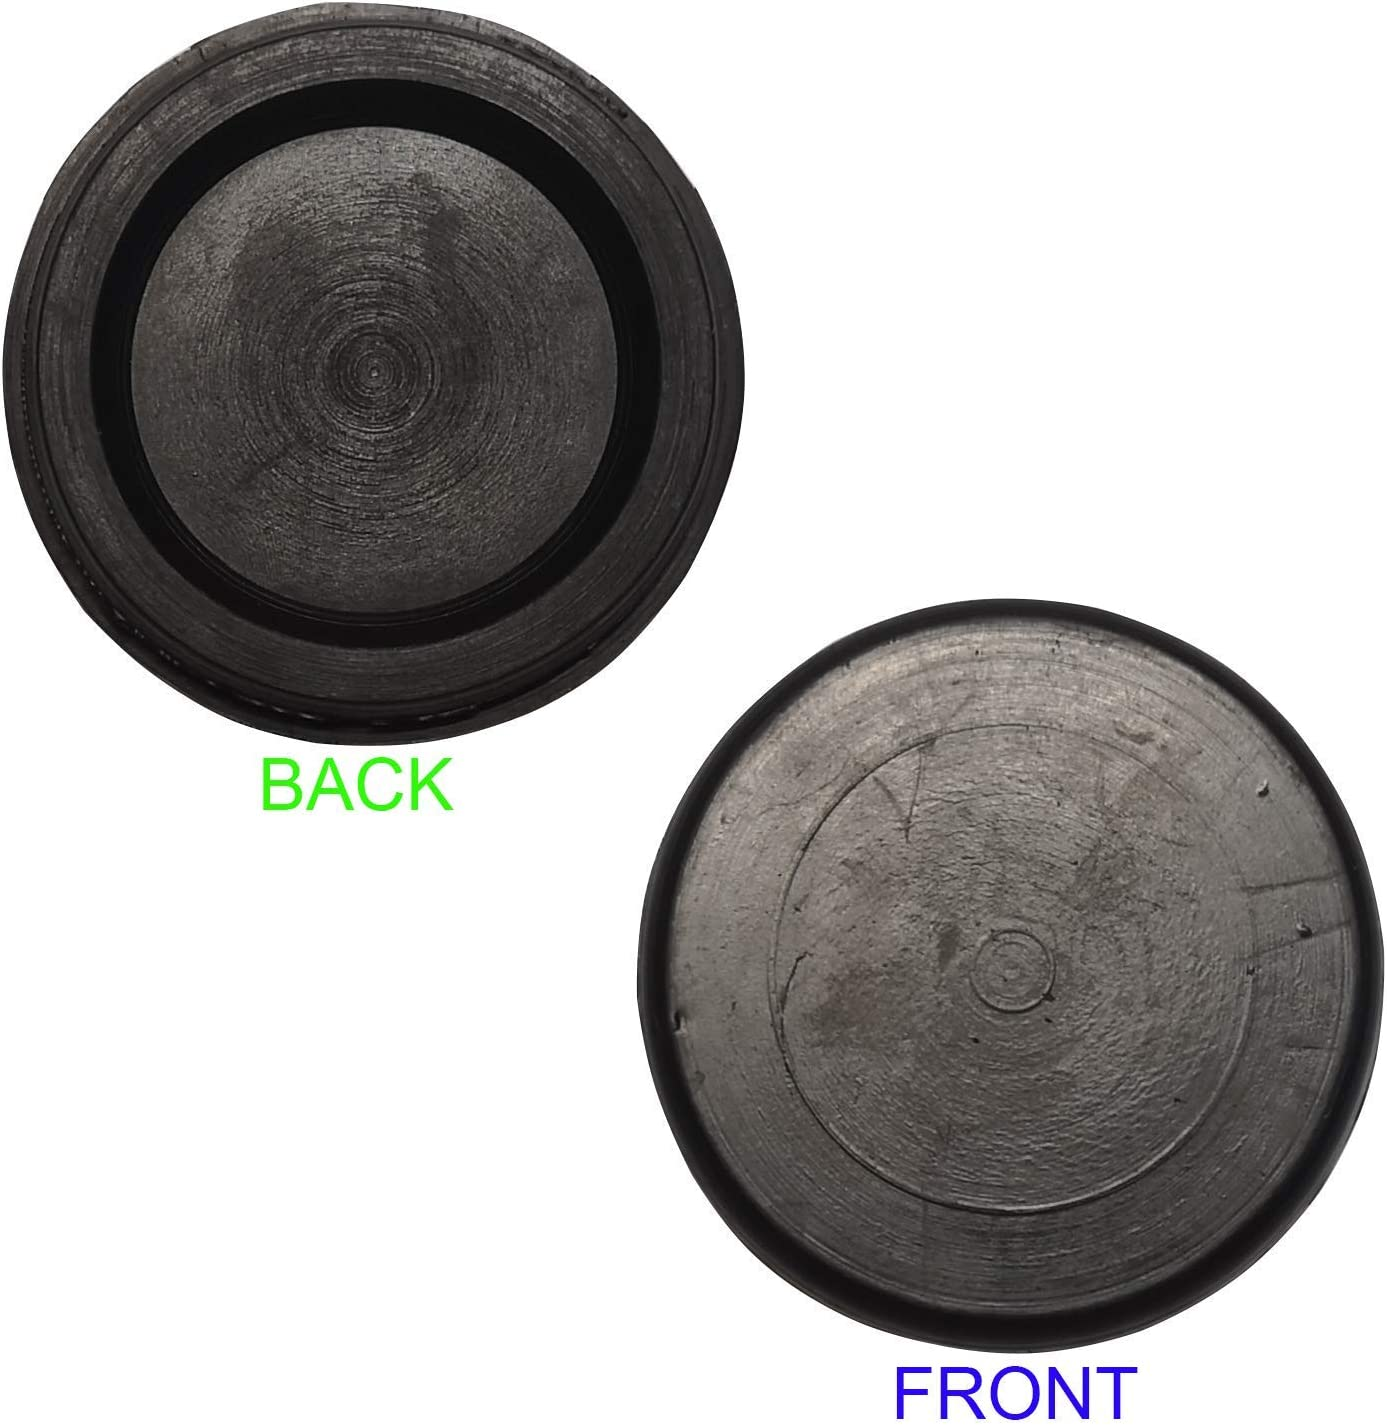 1 St/ück 49 mm Gummidichtung ohne Loch Blindstopfen Firewalldichtung Fixing Hole Caps